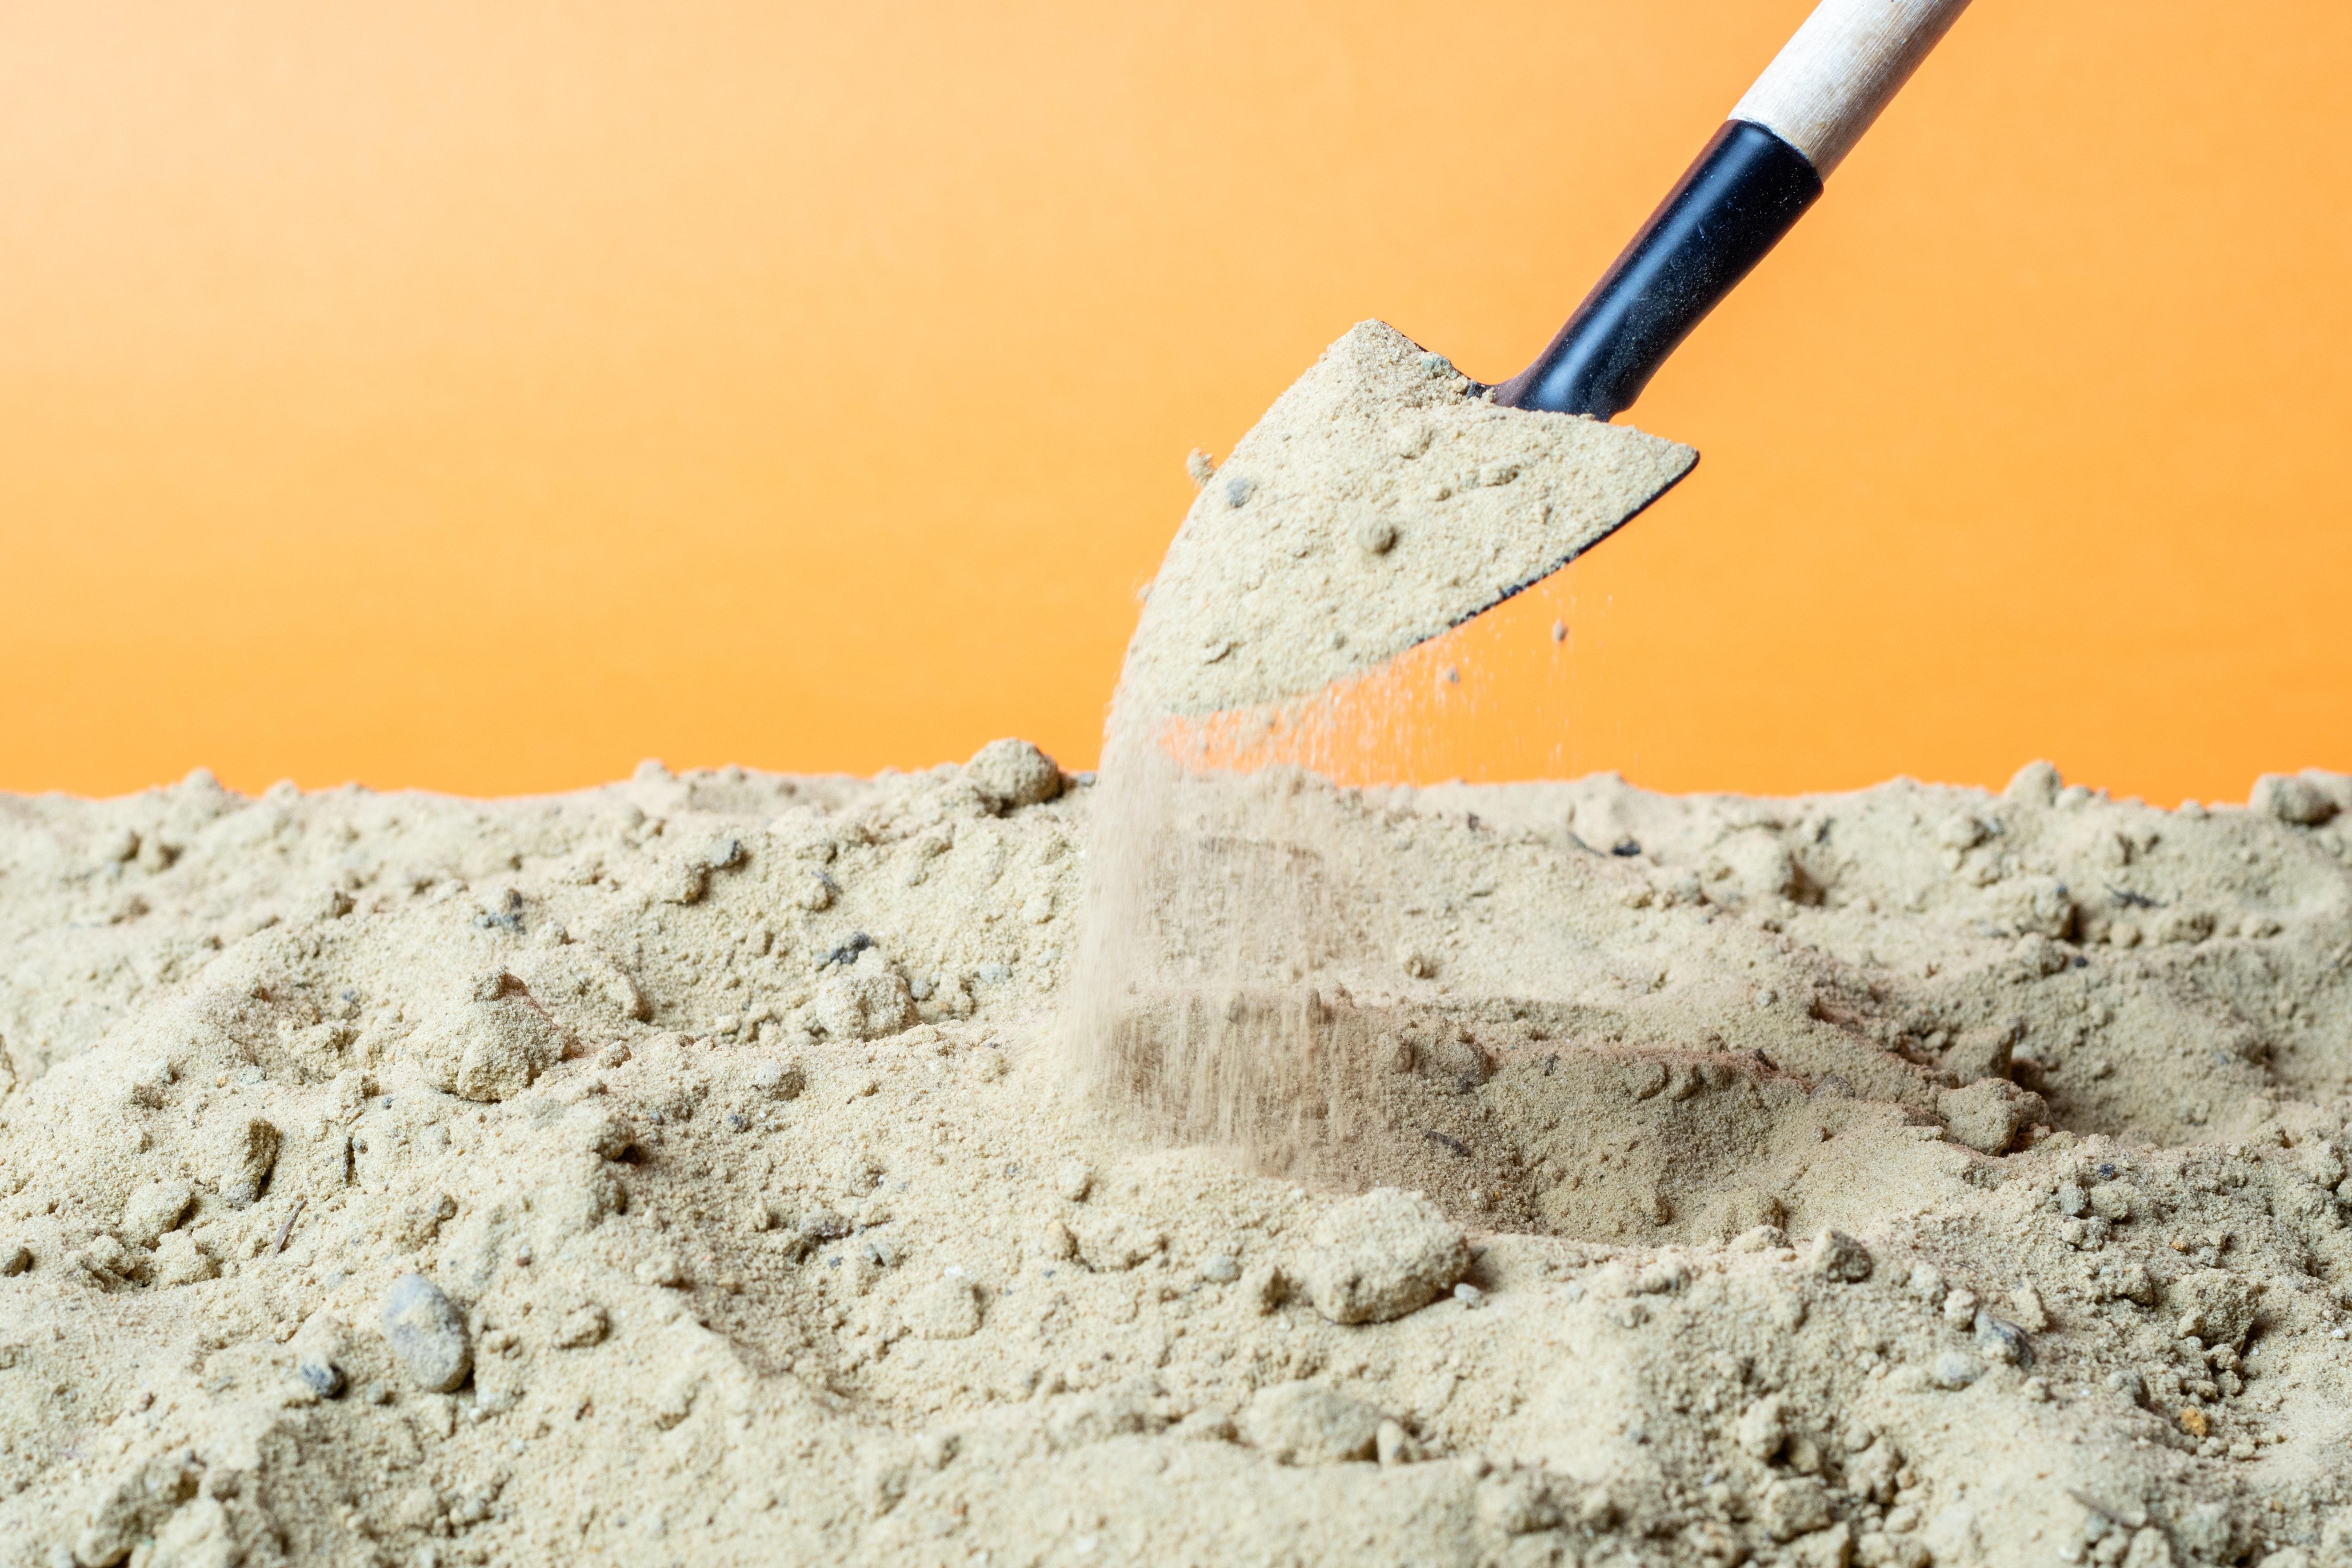 shovel picking up sand against an orange background